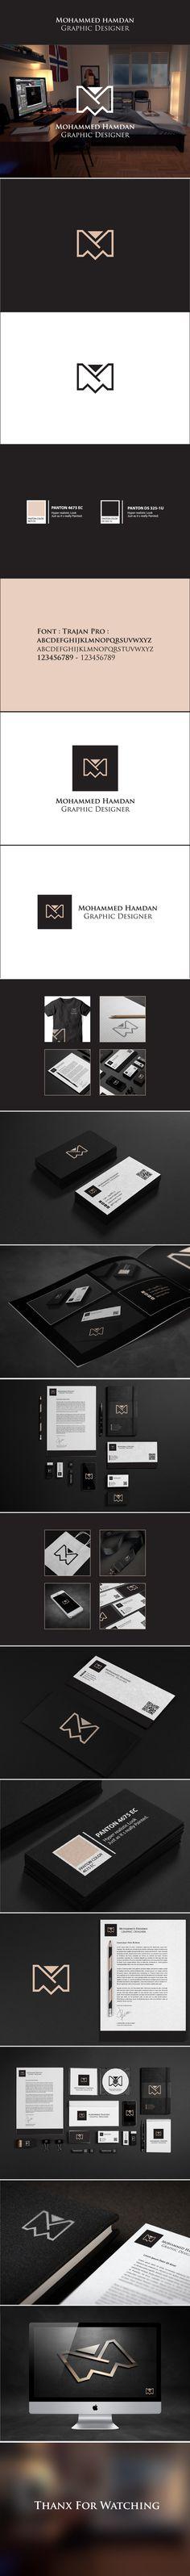 Personal Identity & Personal logo | Designer: mohammed hamdan